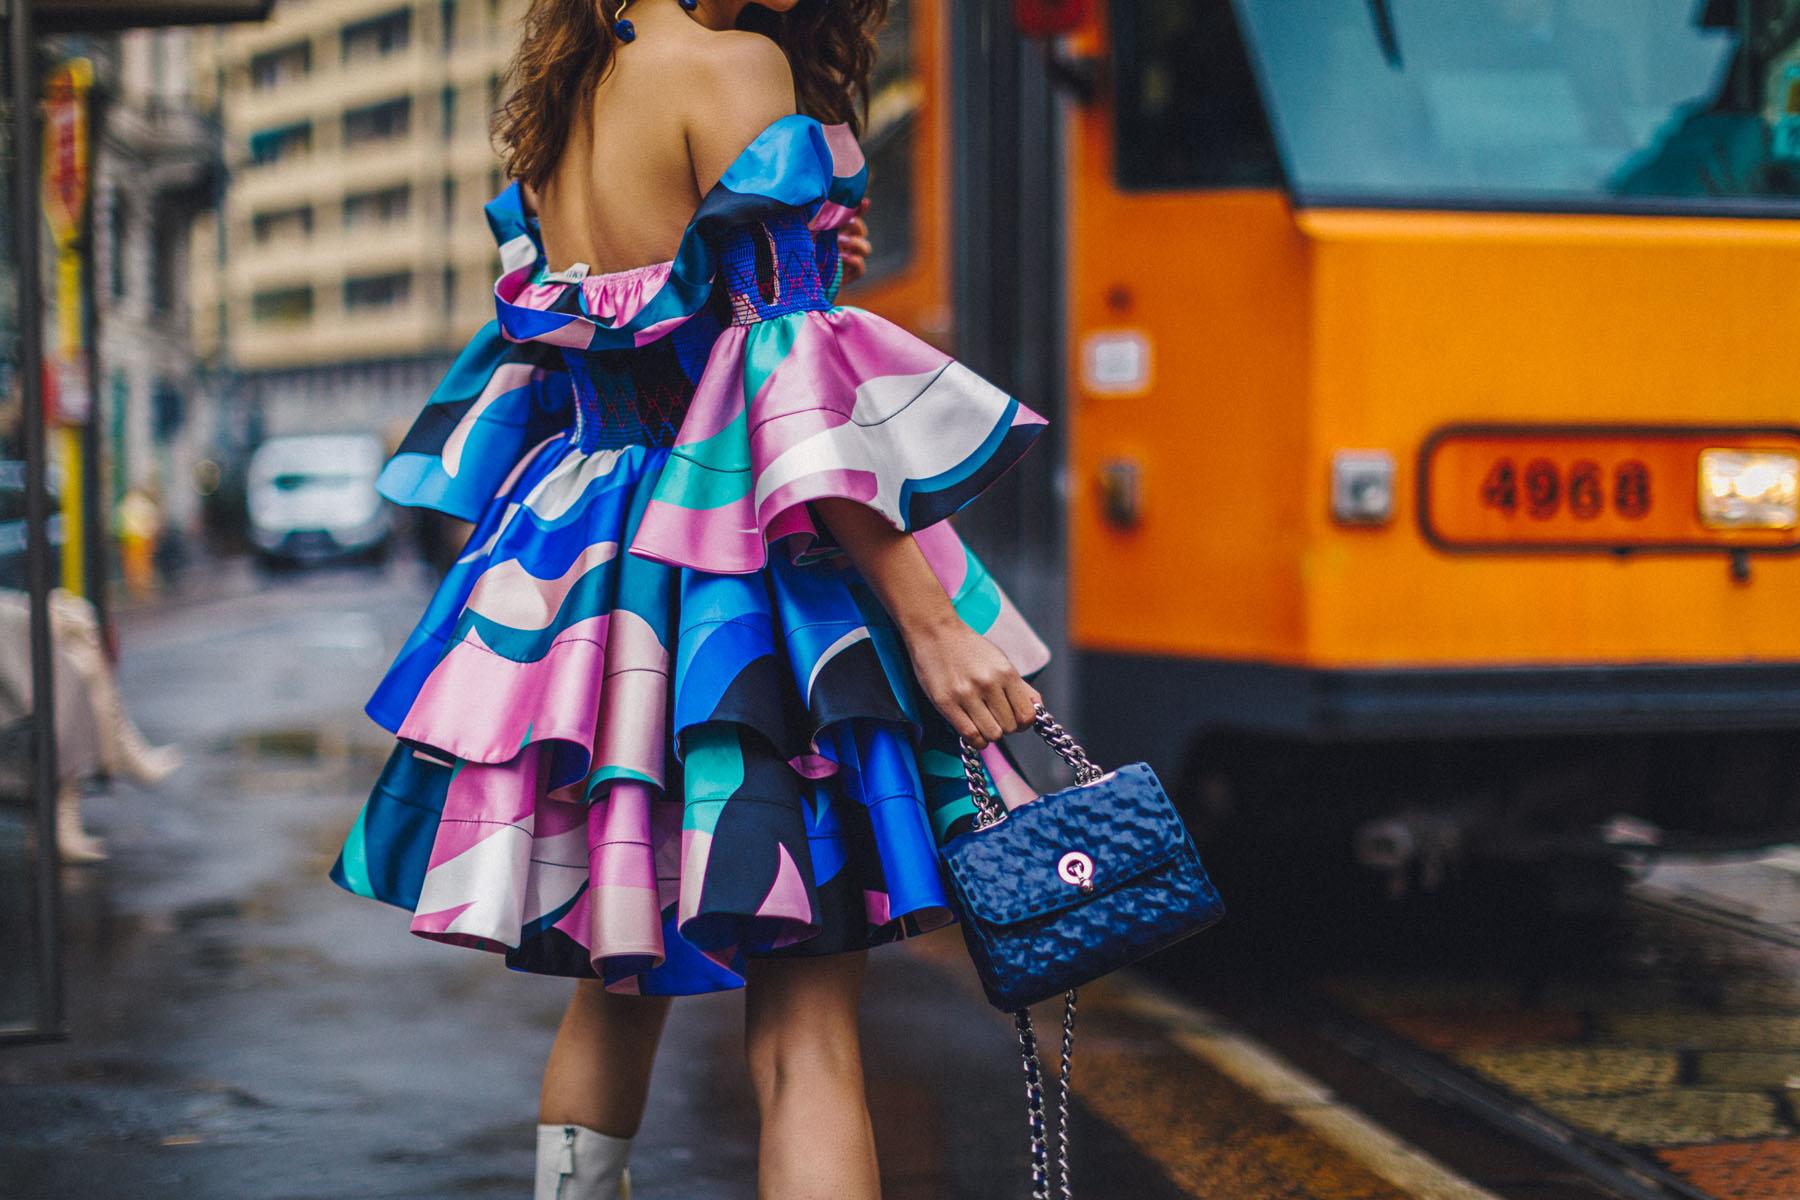 MFW Recap - Emilio Pucci Look, MFW Street Style, Emilio Pucci Dress, Colorful Ruffle dress, Fashion Week Street Style // Notjessfashion.com